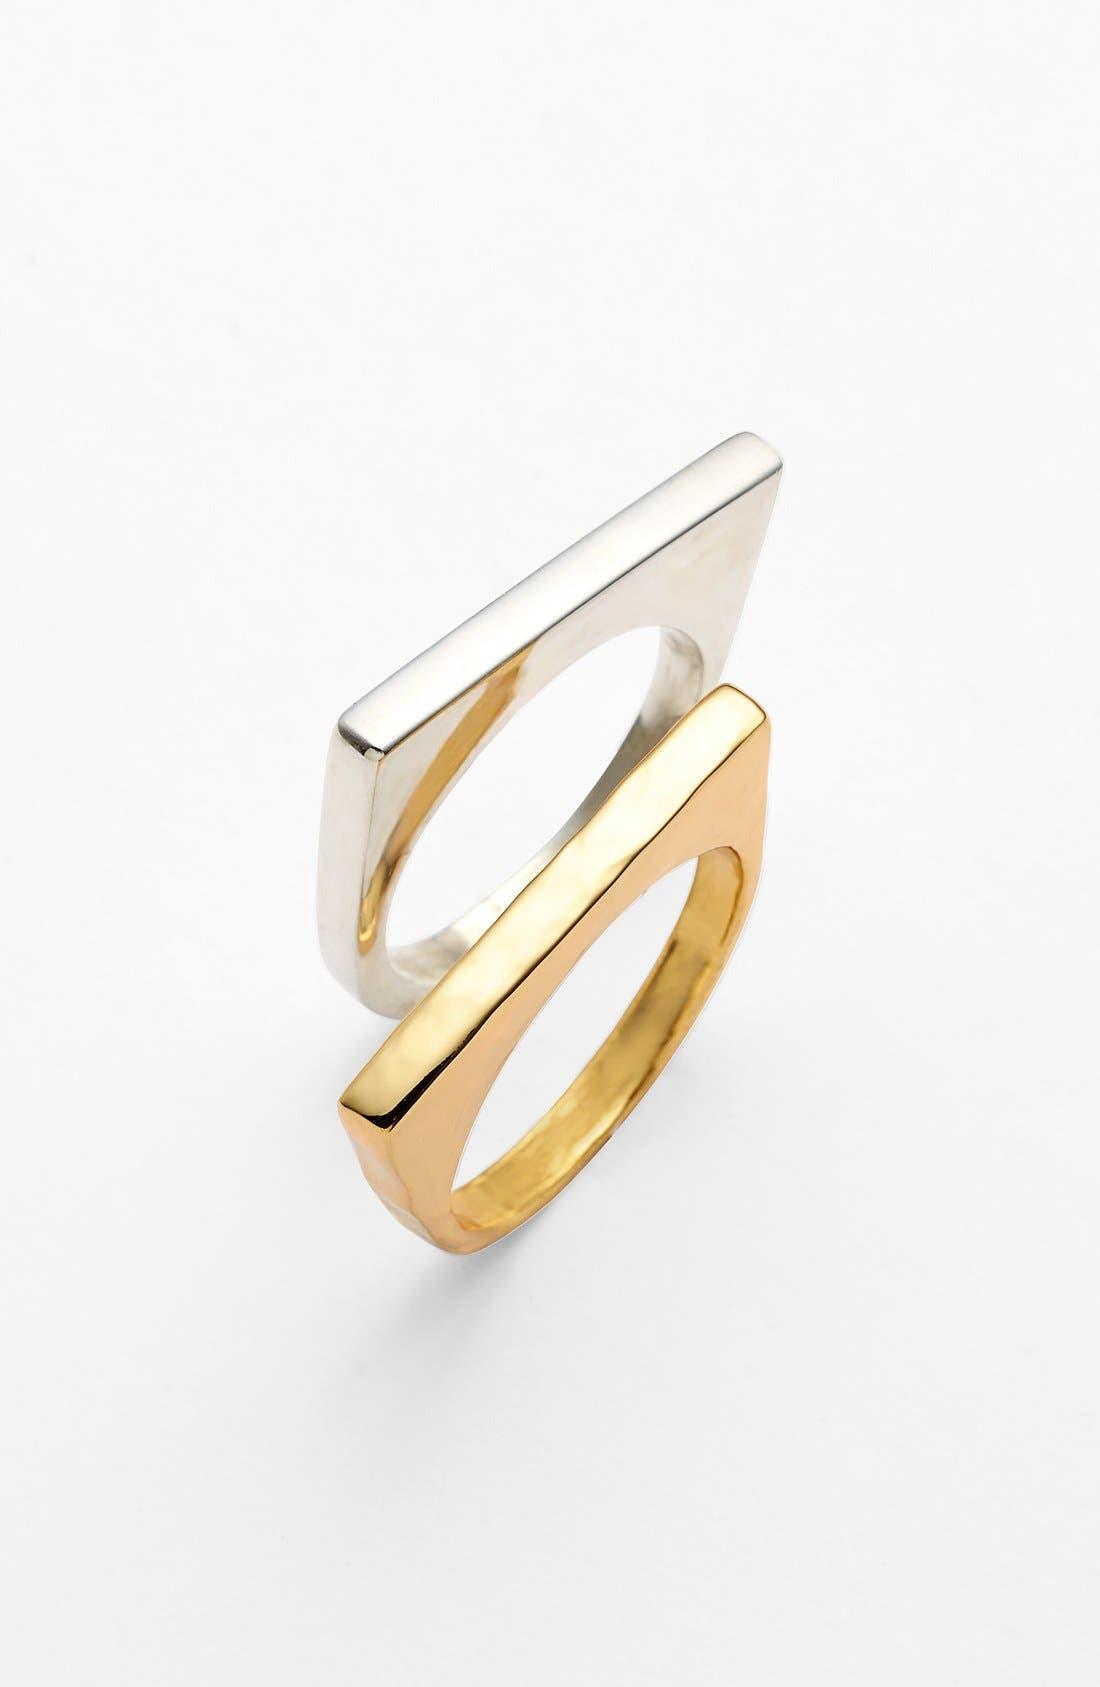 Alternate Image 1 Selected - Argento Vivo Straight Edge Rings (Set of 2)